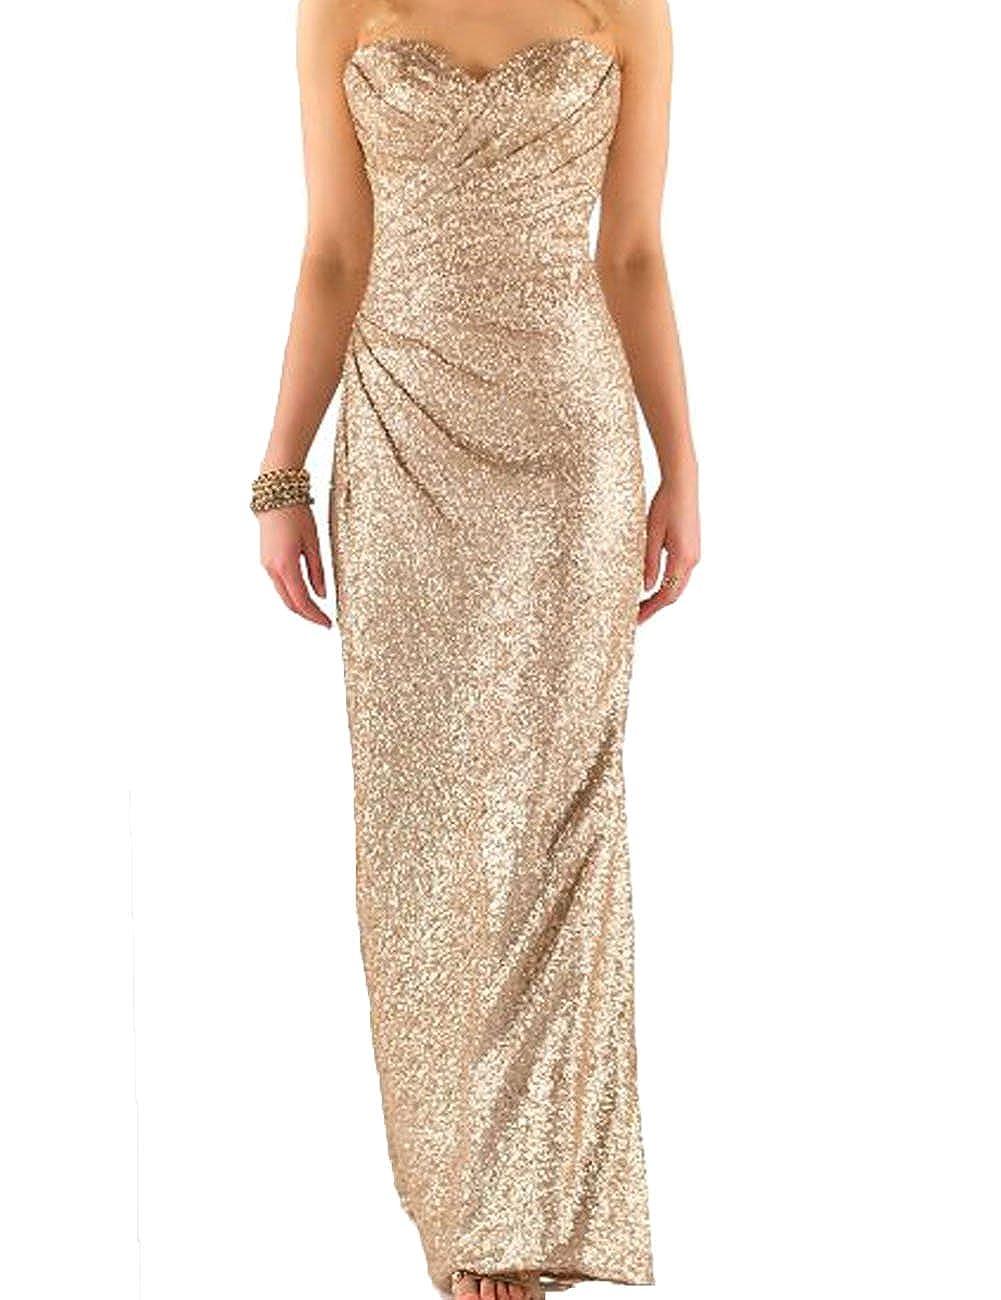 5660c00a139 Top 10 wholesale Plus Size Cocktail Gowns - Chinabrands.com